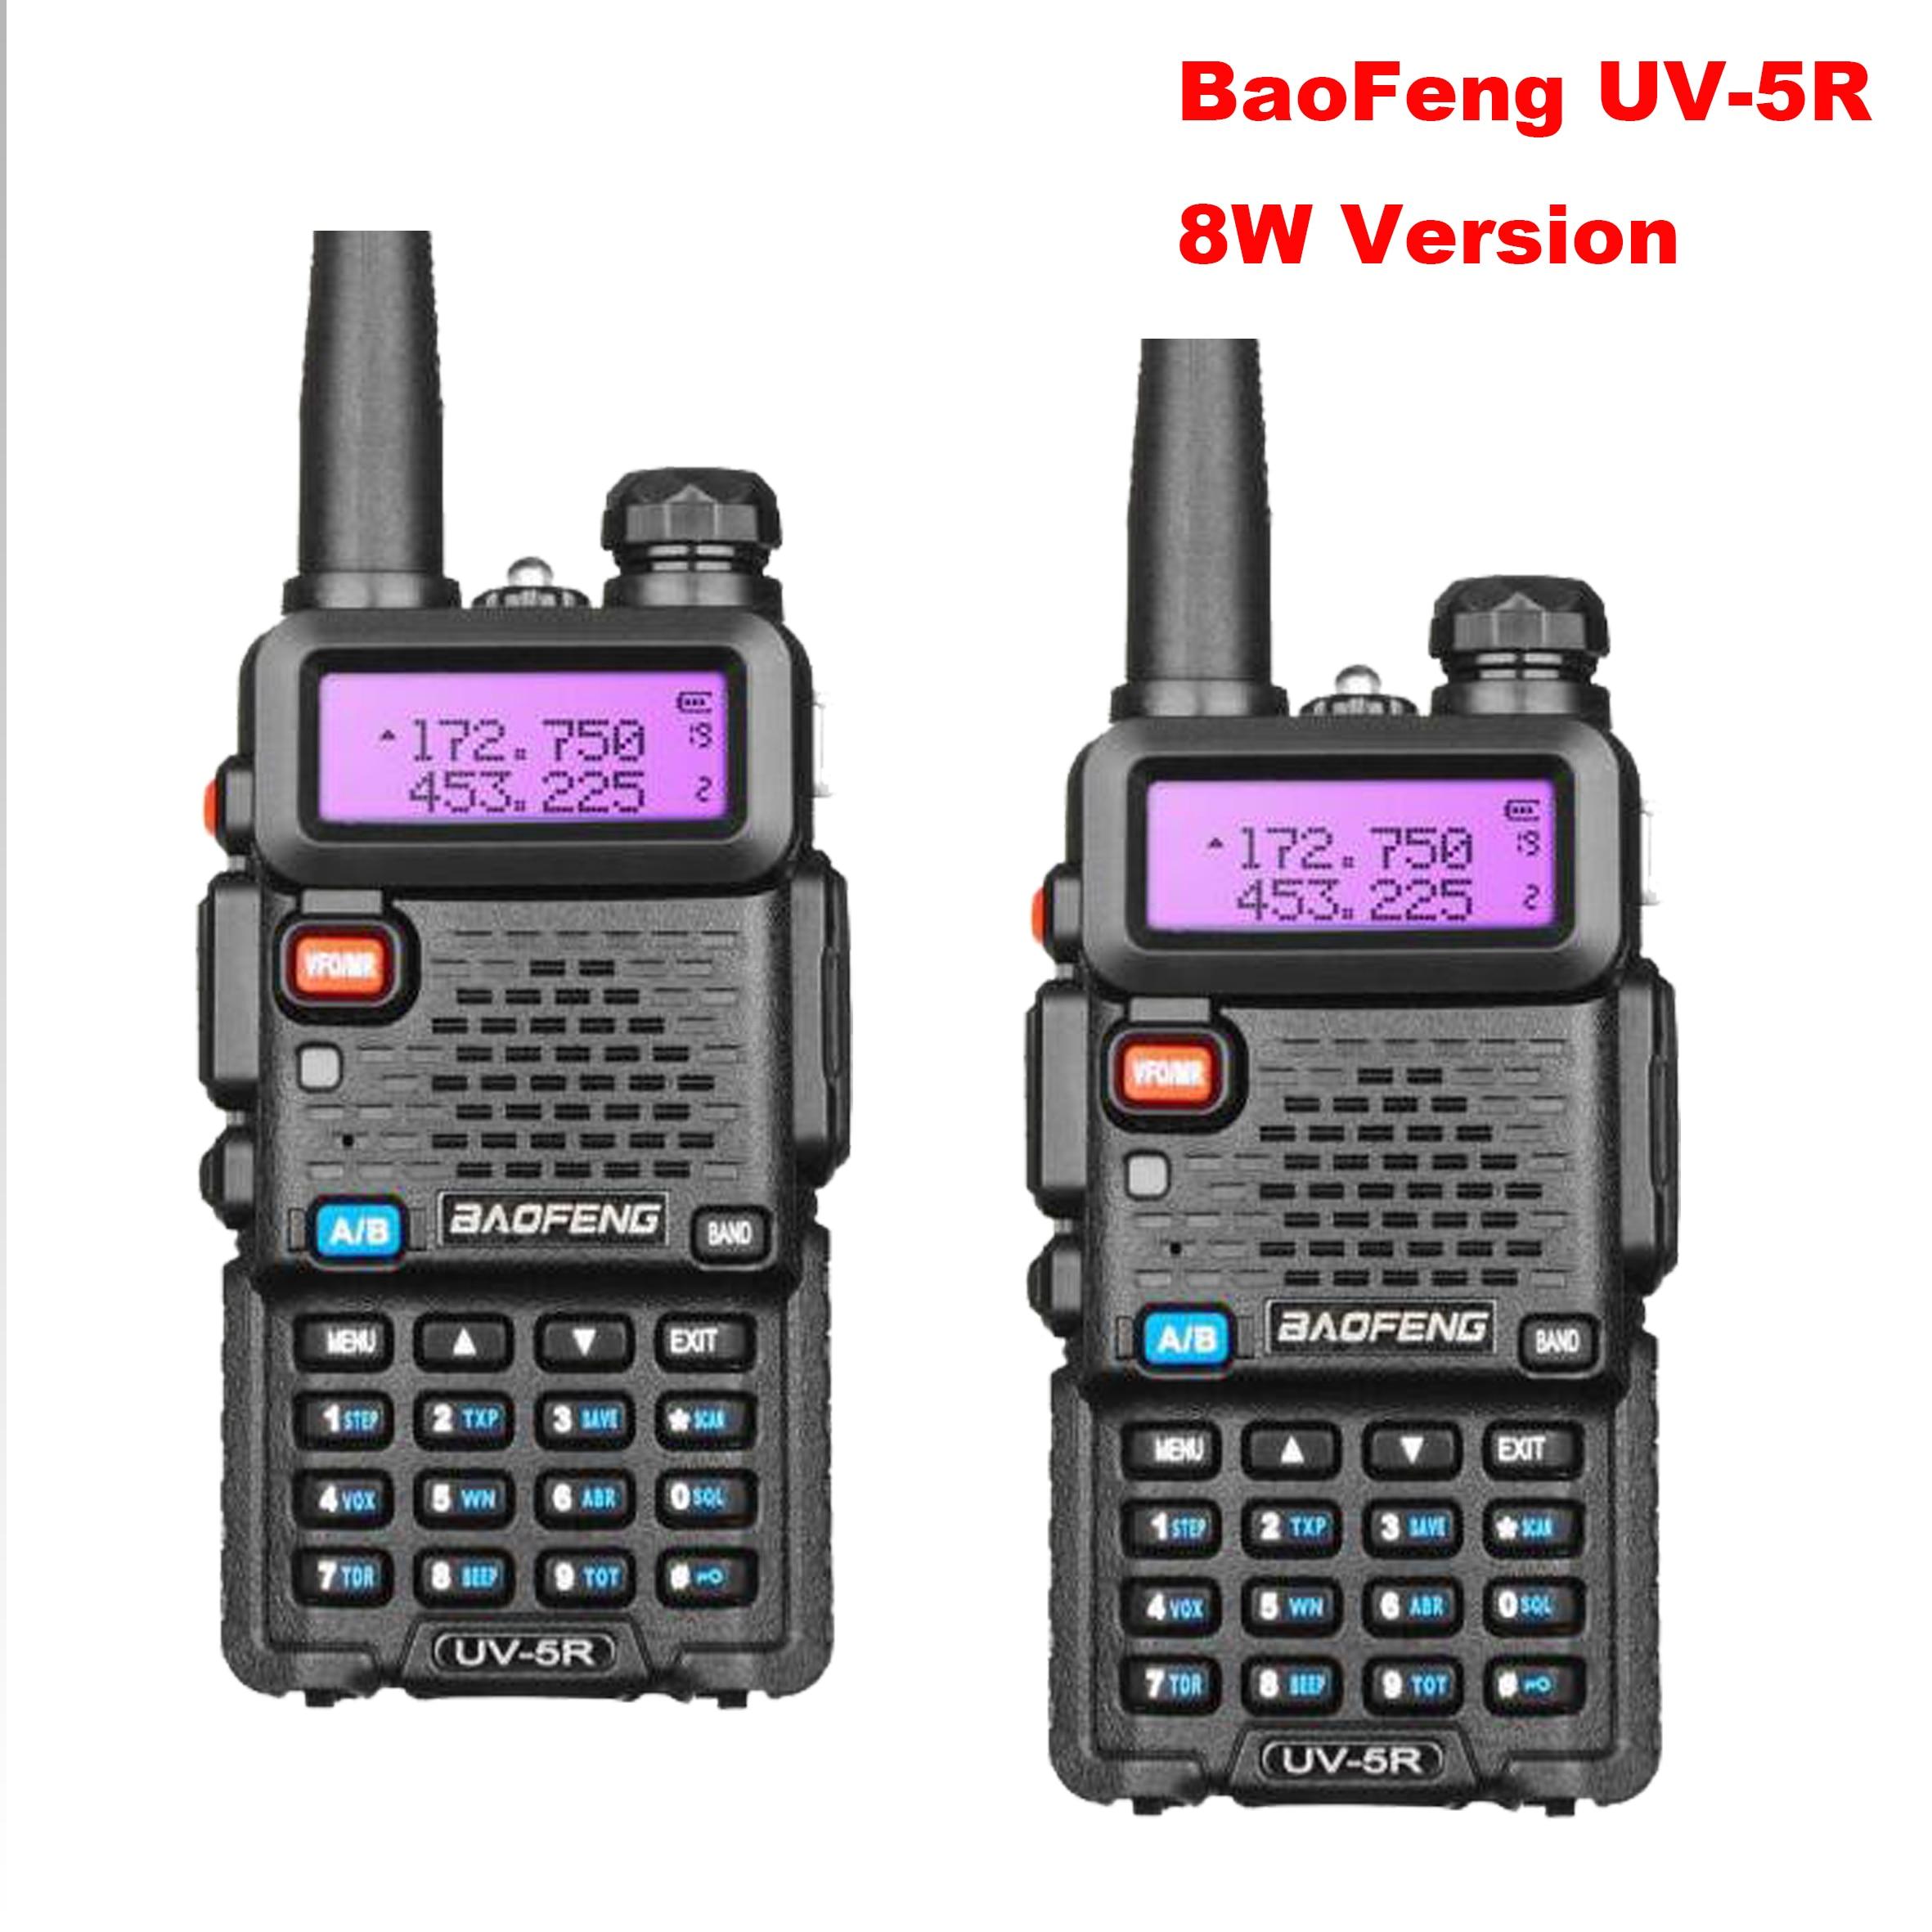 New Baofeng UV 5R 8W Walkie Talkie Upgrade 5R High Power Portable Two Way Radio Dual